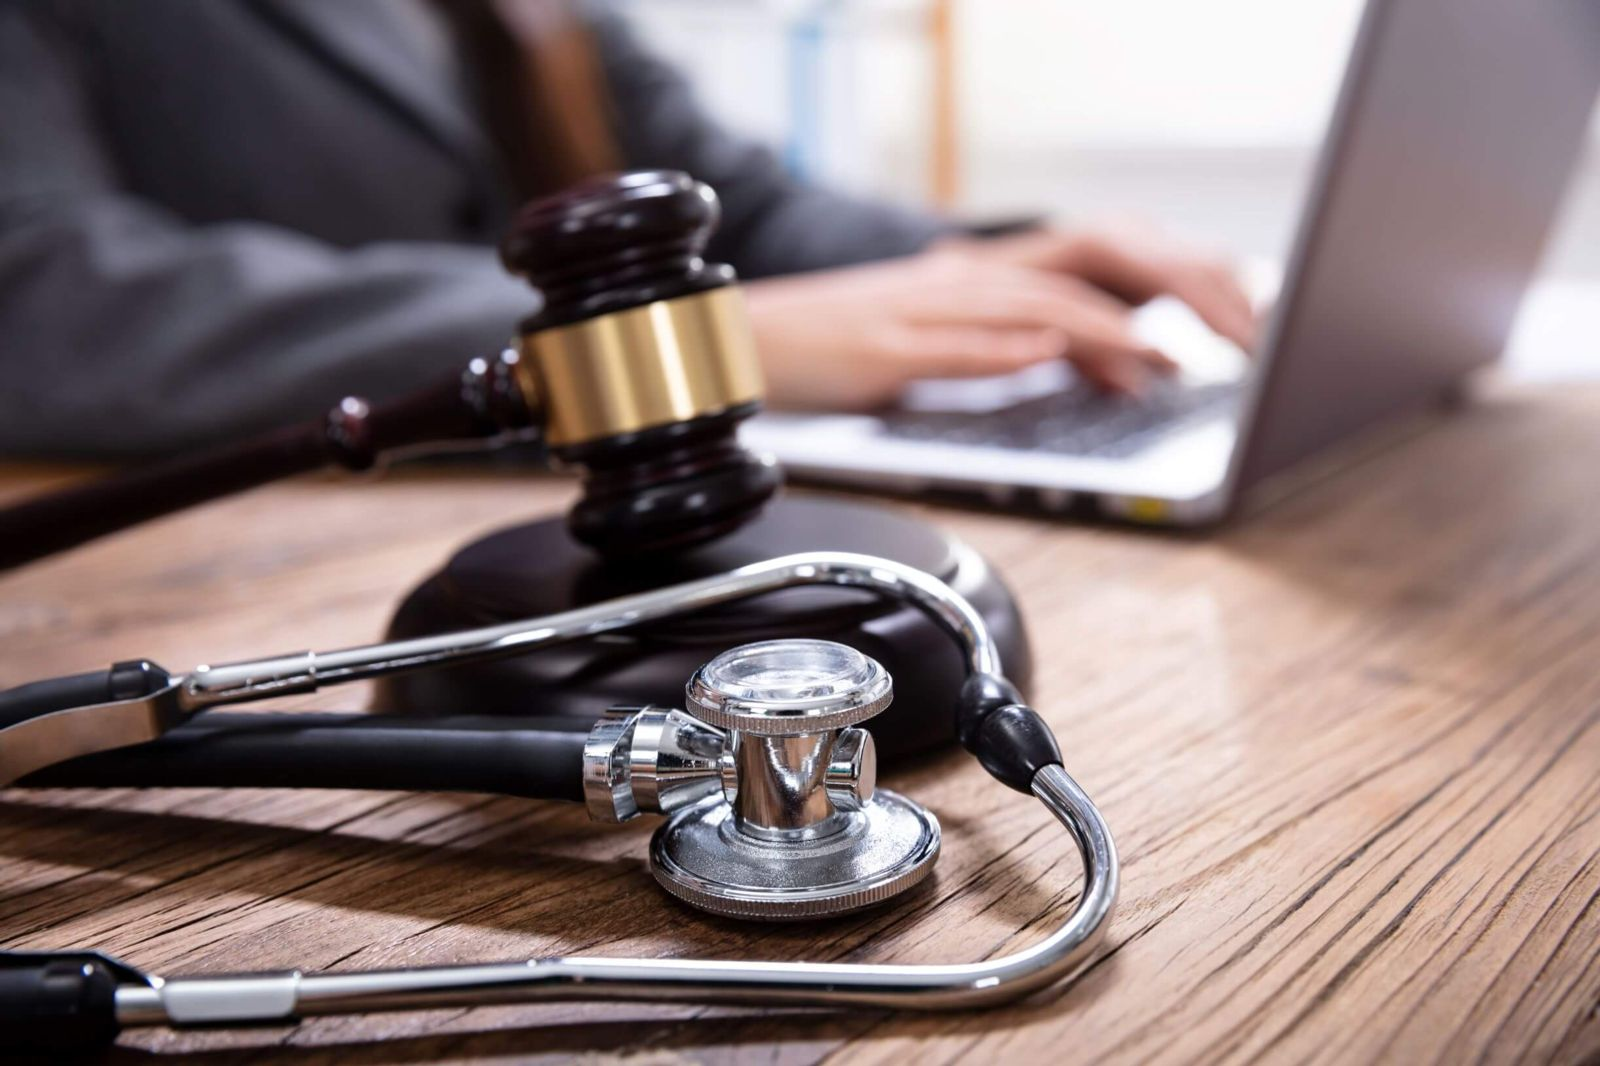 Filing a Medical Malpractice Case